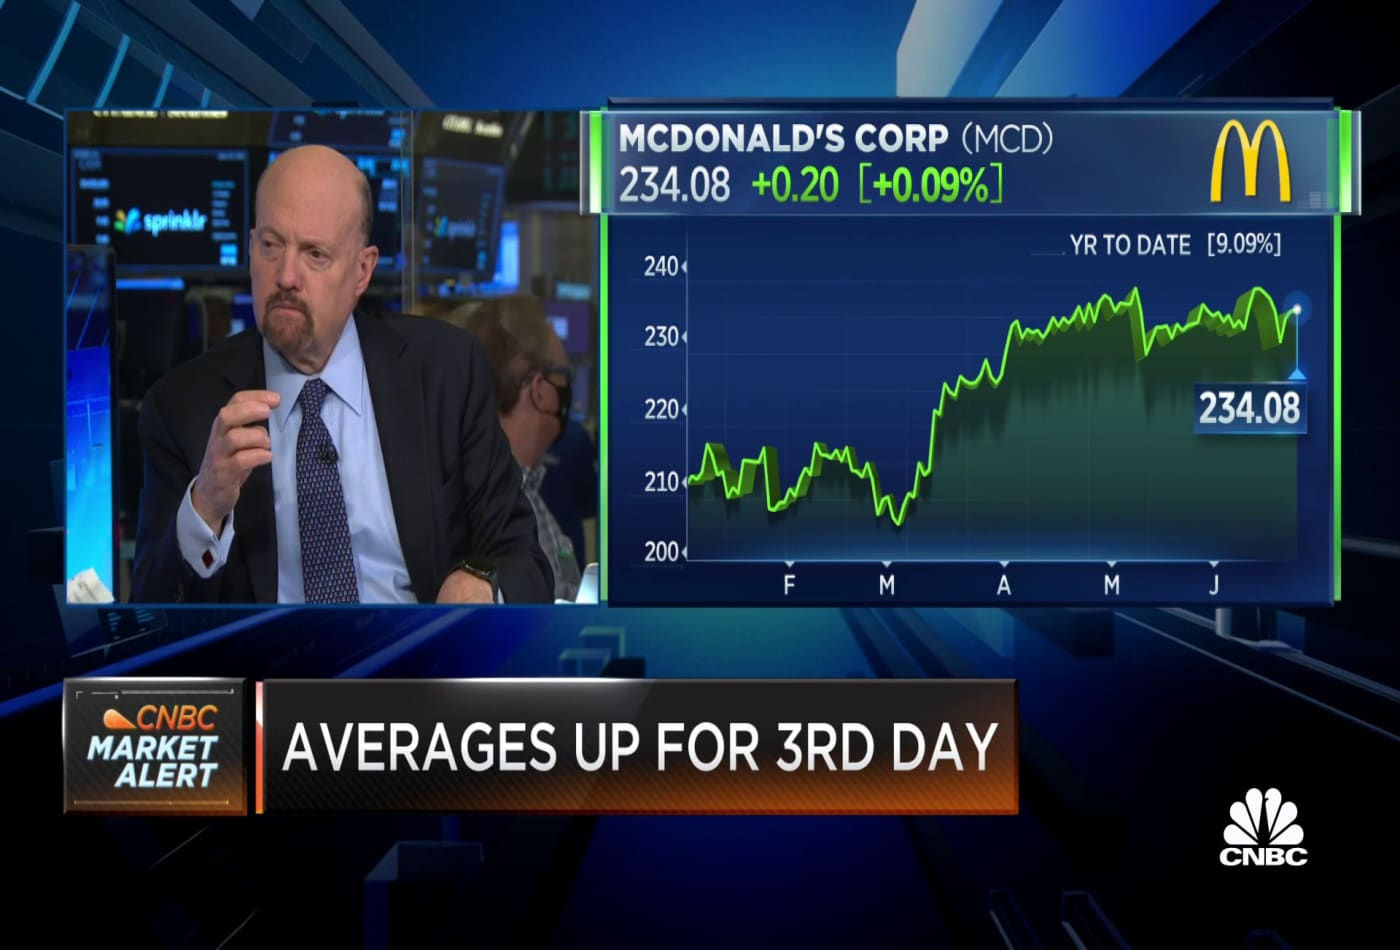 Jim Cramer on Intercontinental Exchange and McDonald's